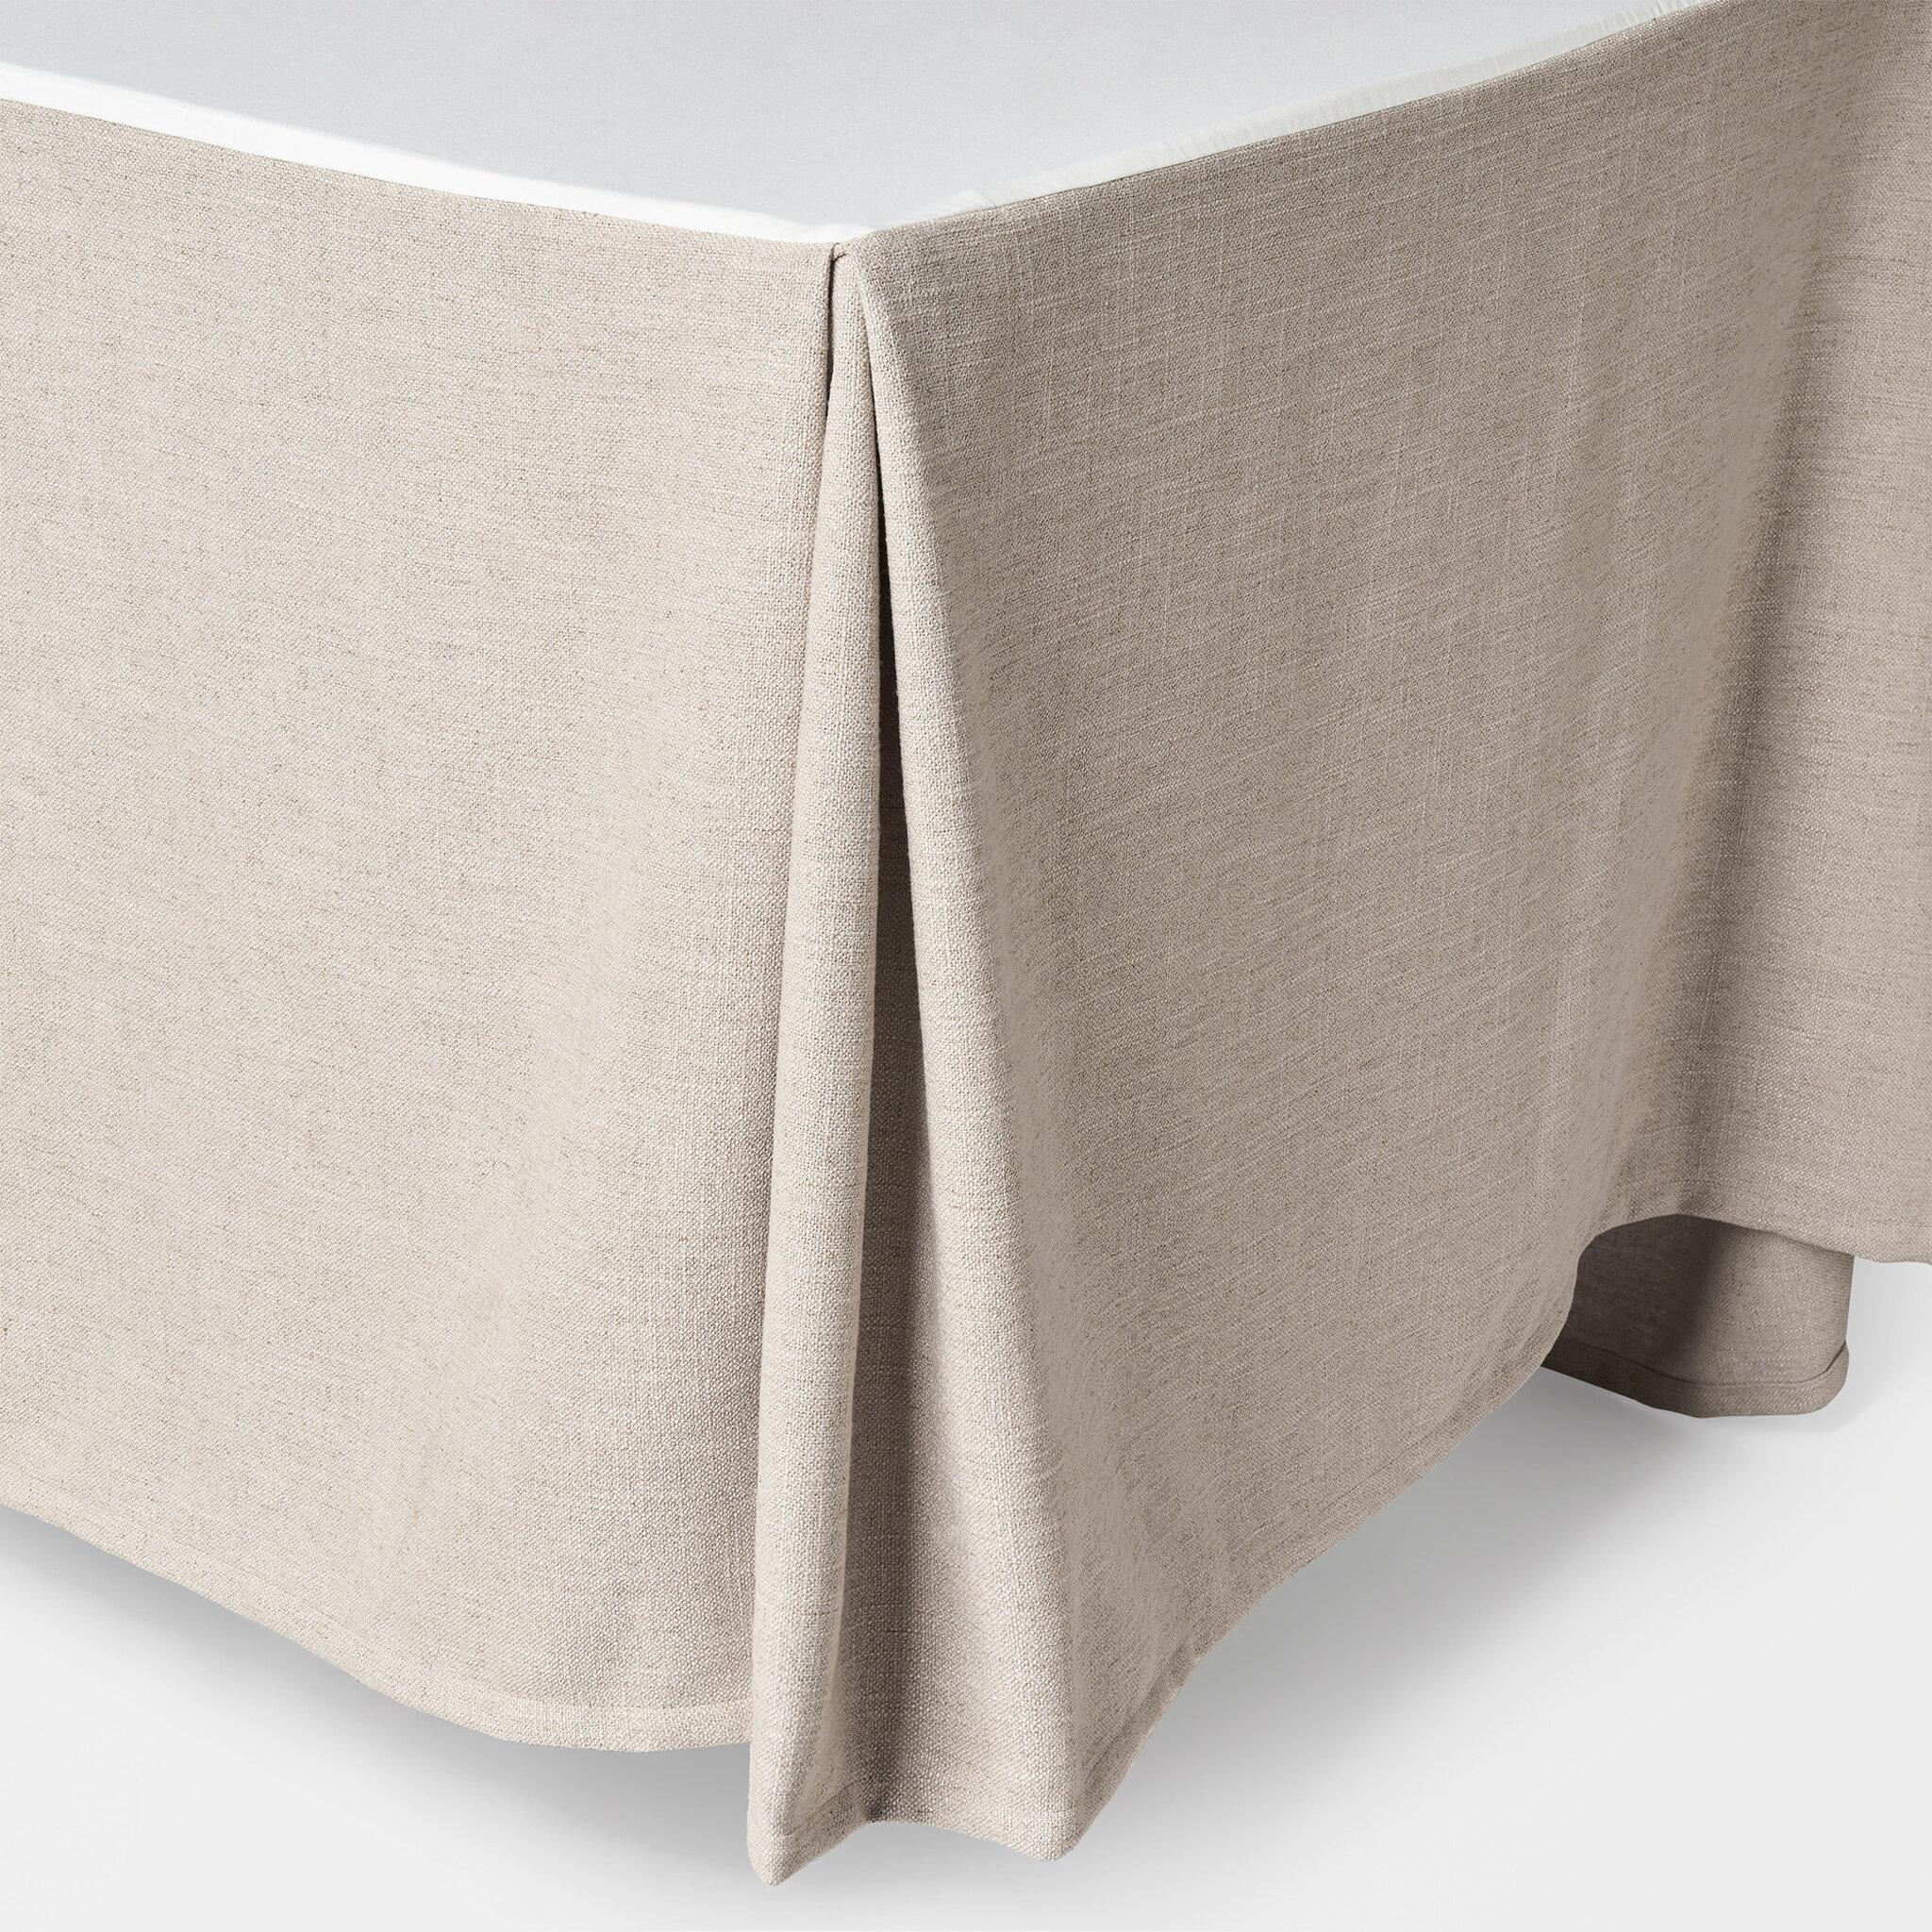 Sängkappa LOUISE 180x200 cm